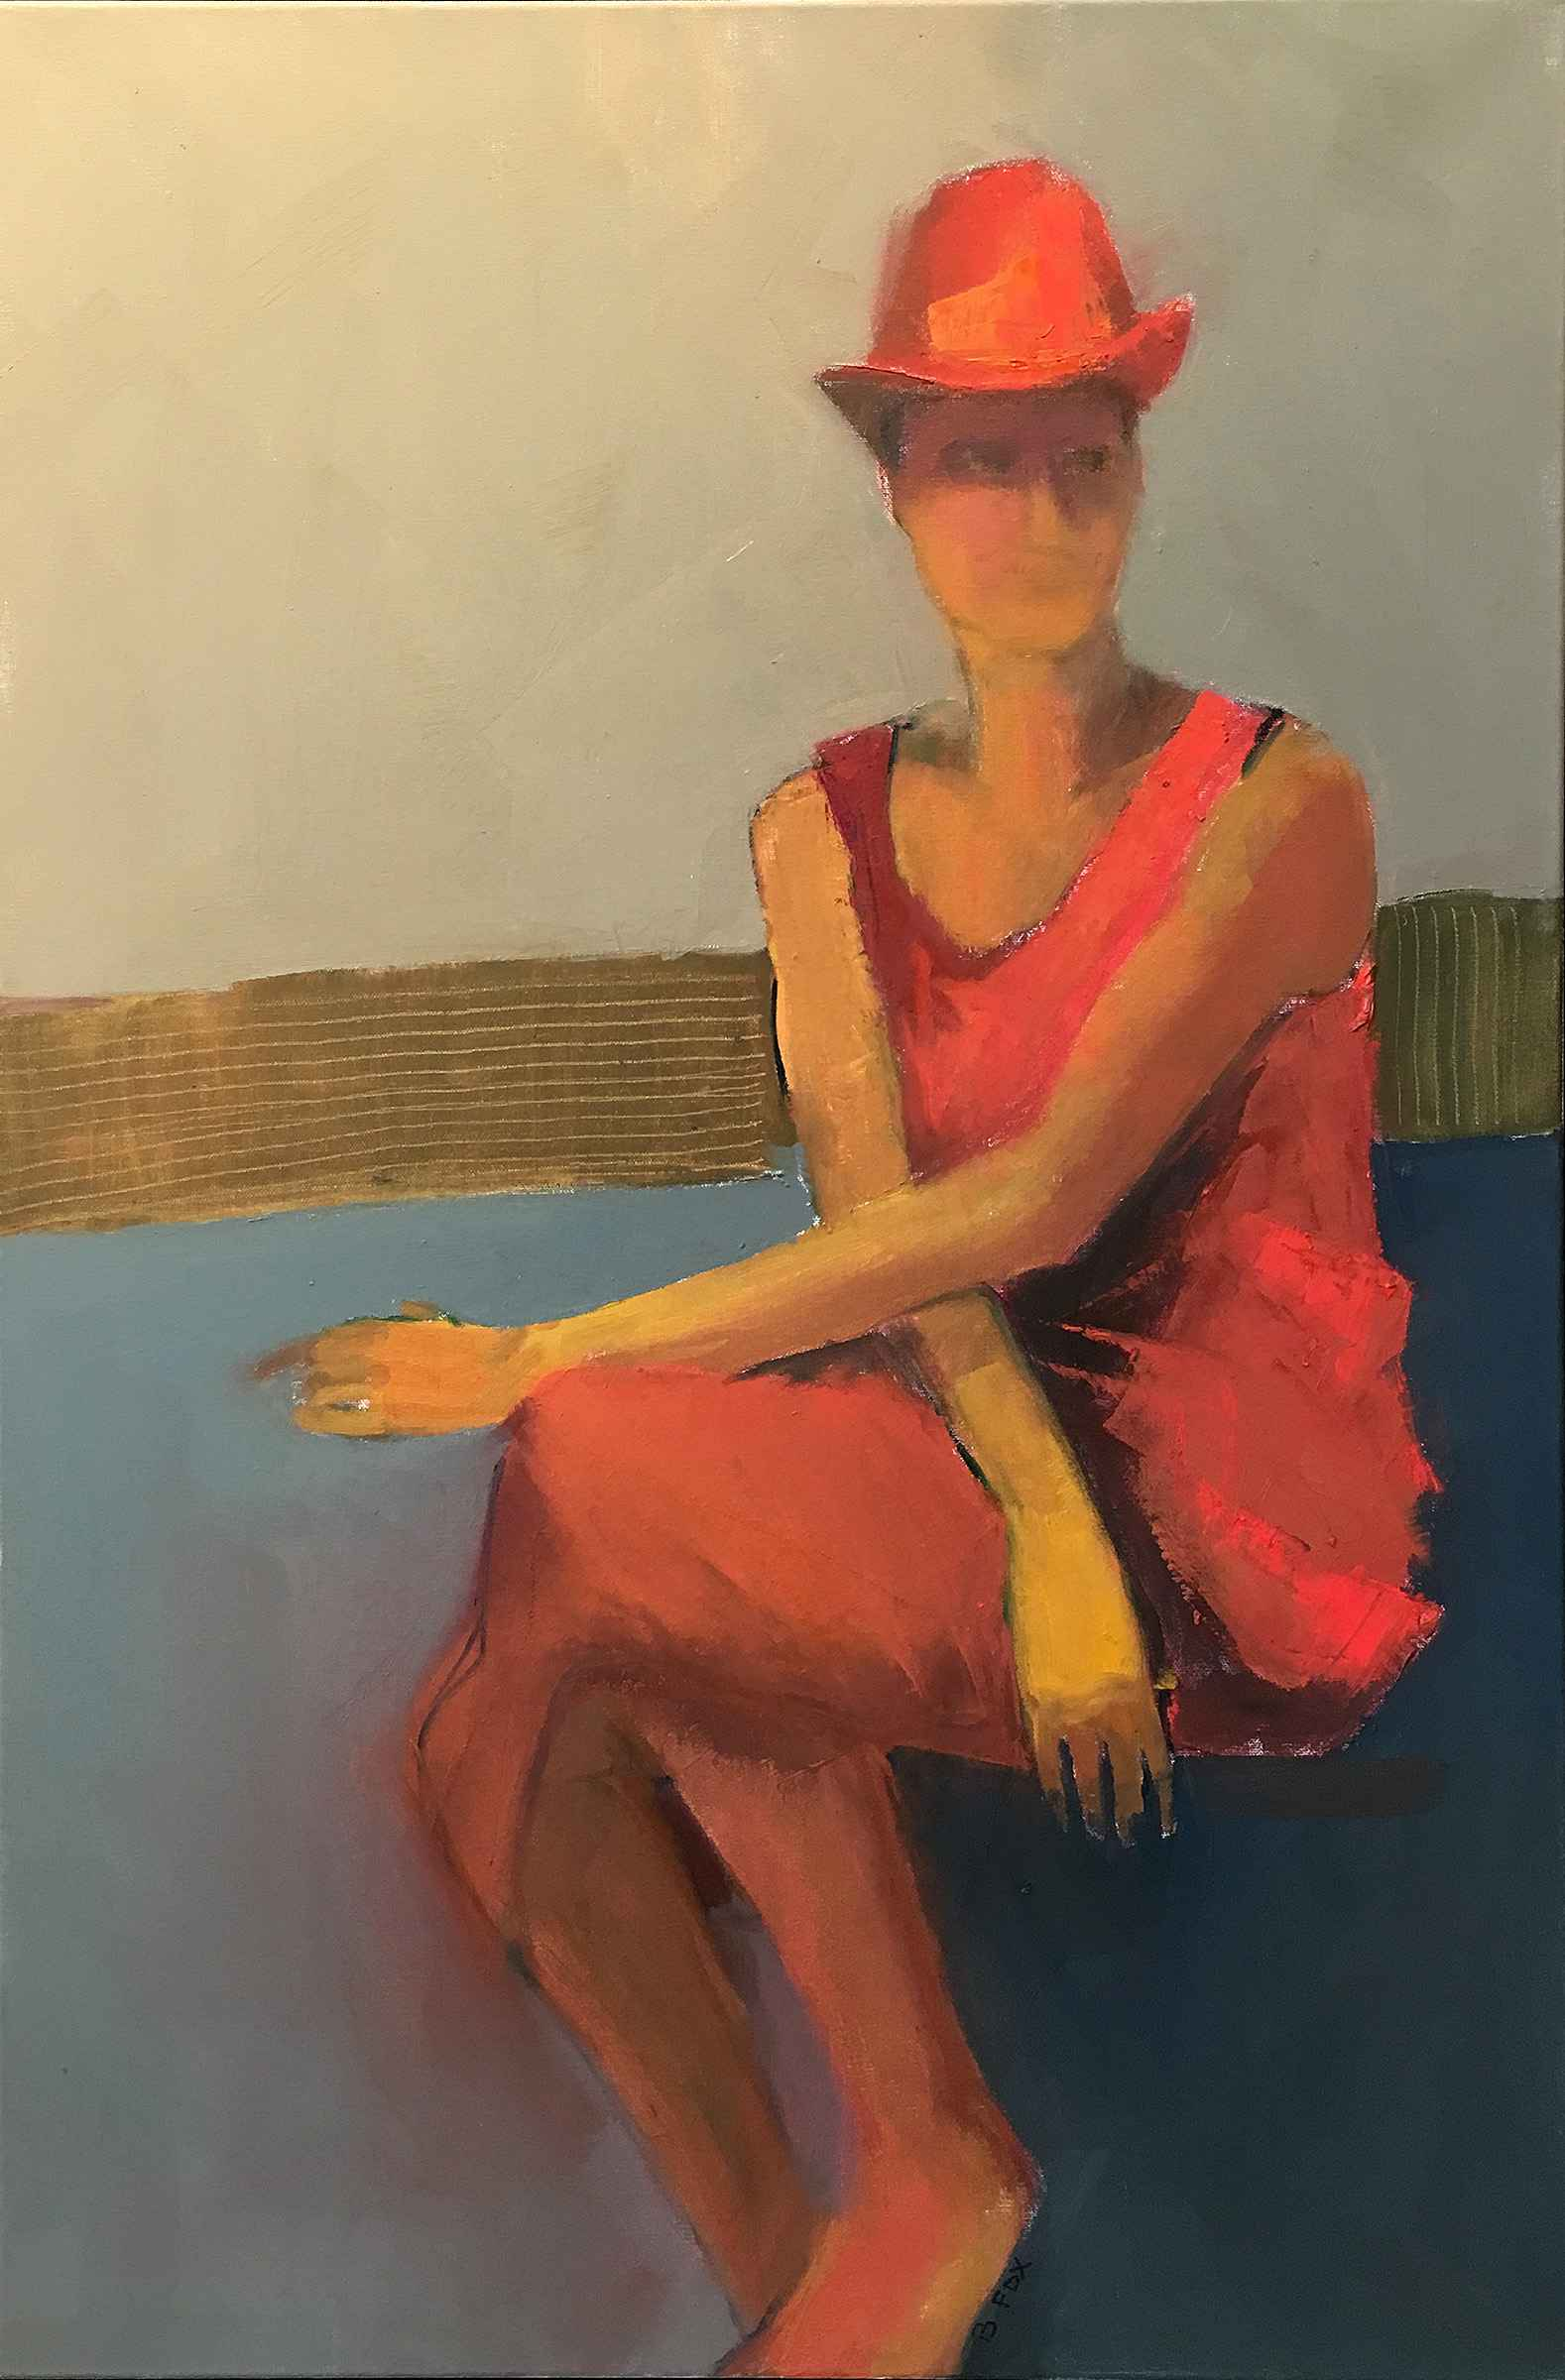 All in Red by  Brenda Fox - Masterpiece Online